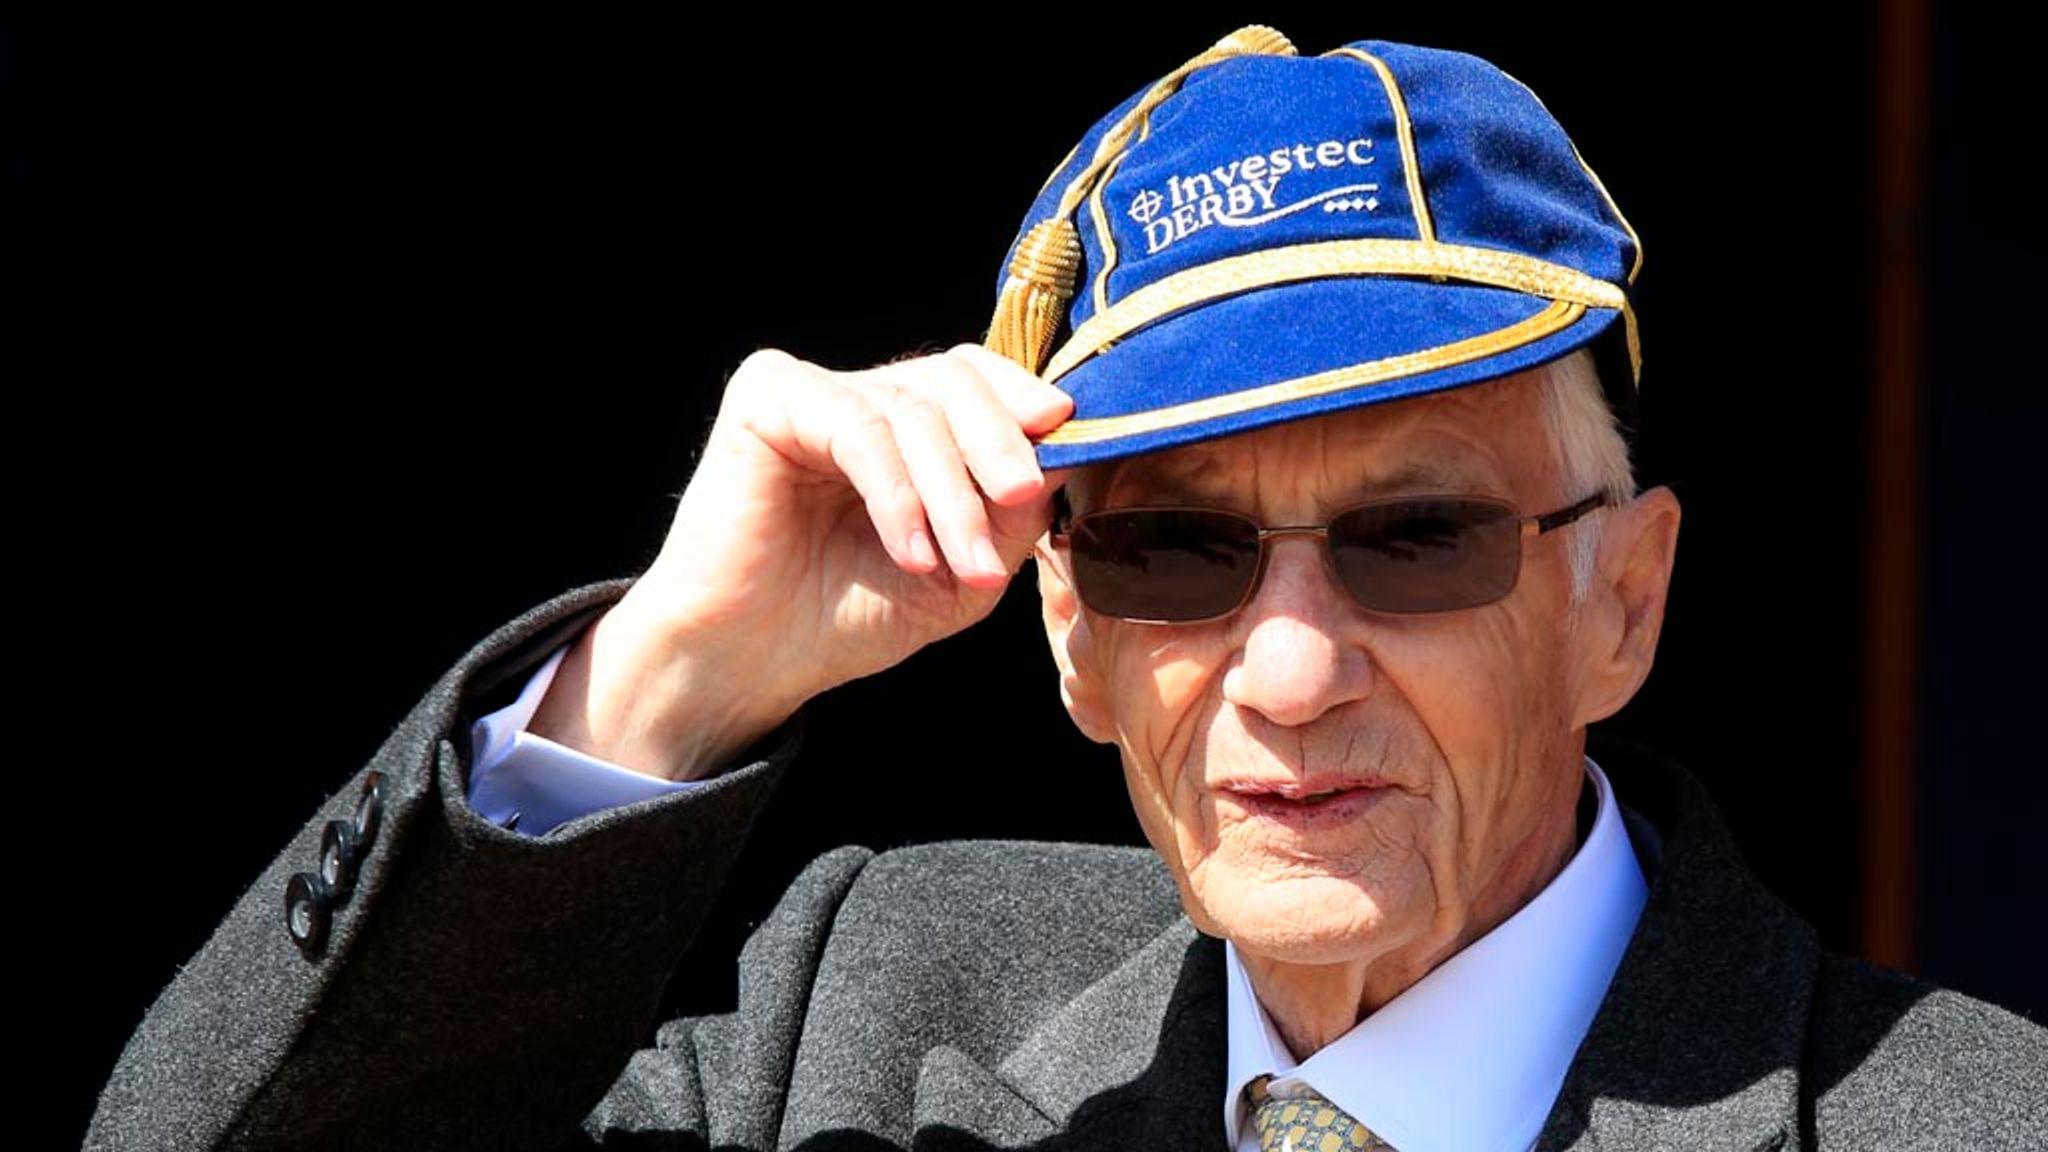 Lester Piggott sports the new Derby cap at Epsom.